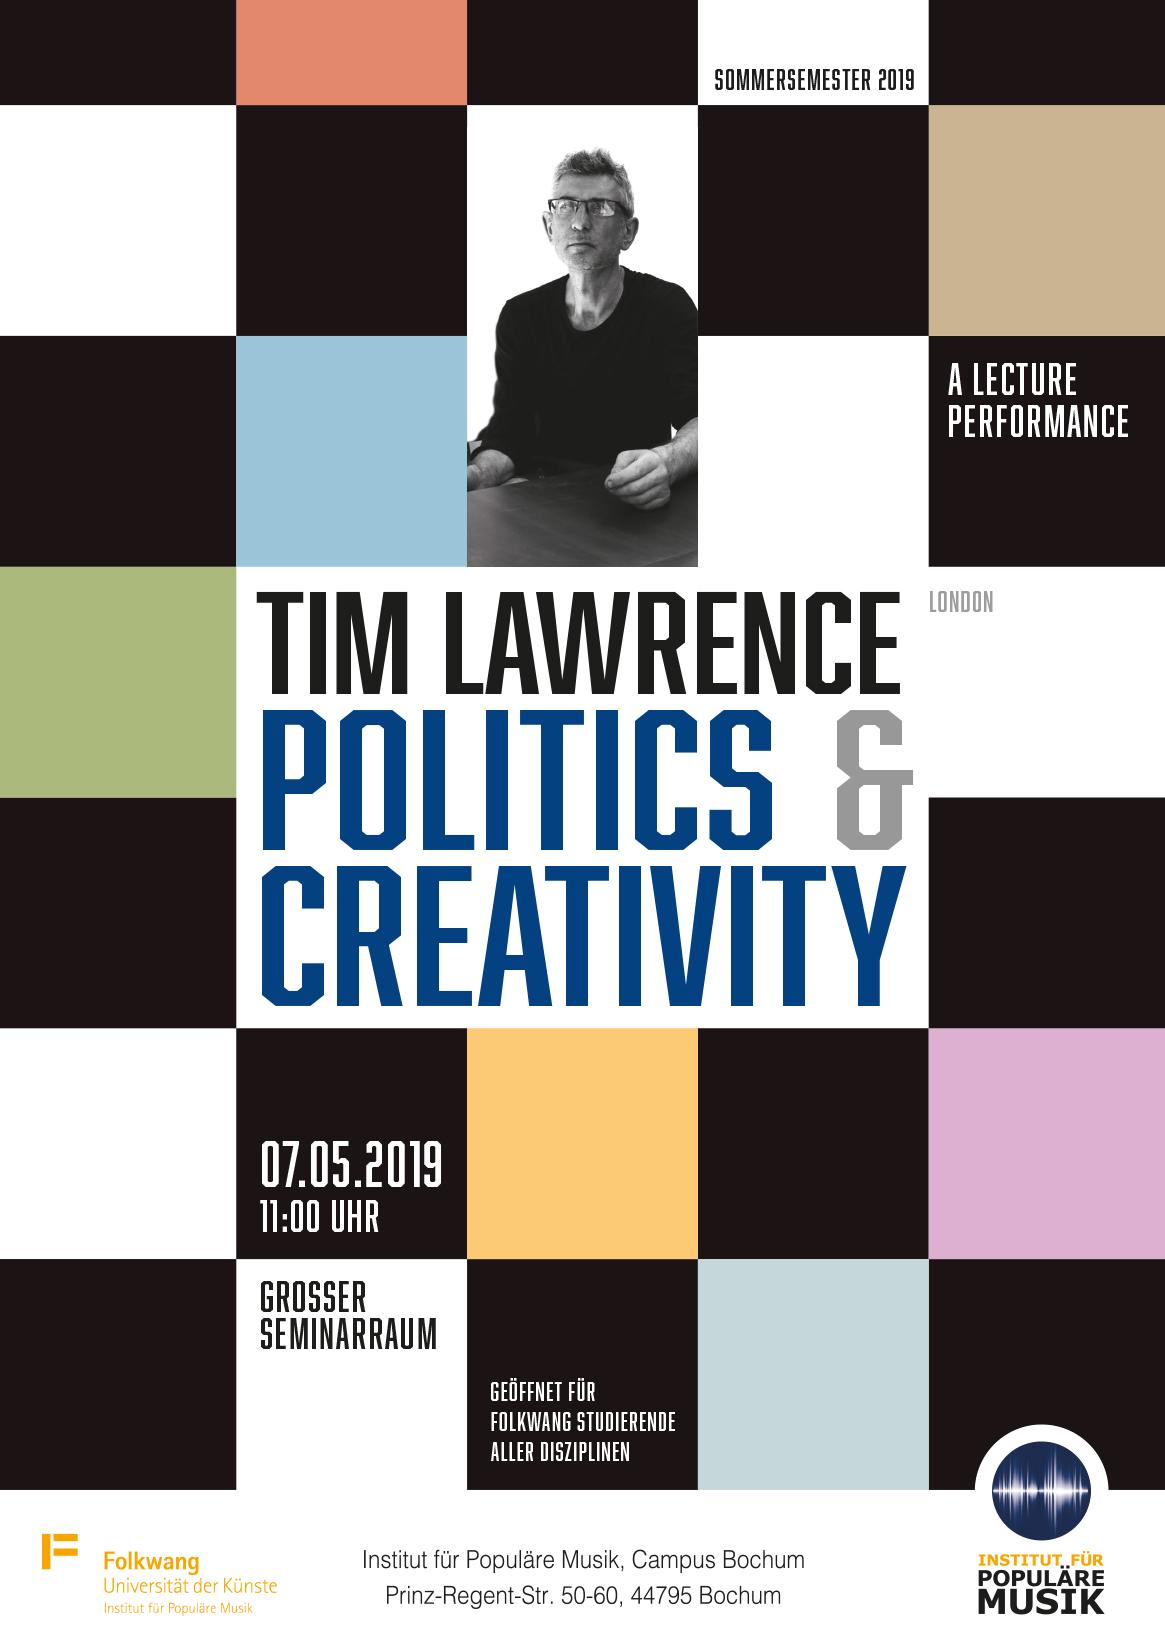 Tim Lawrence - Politics & Creativity